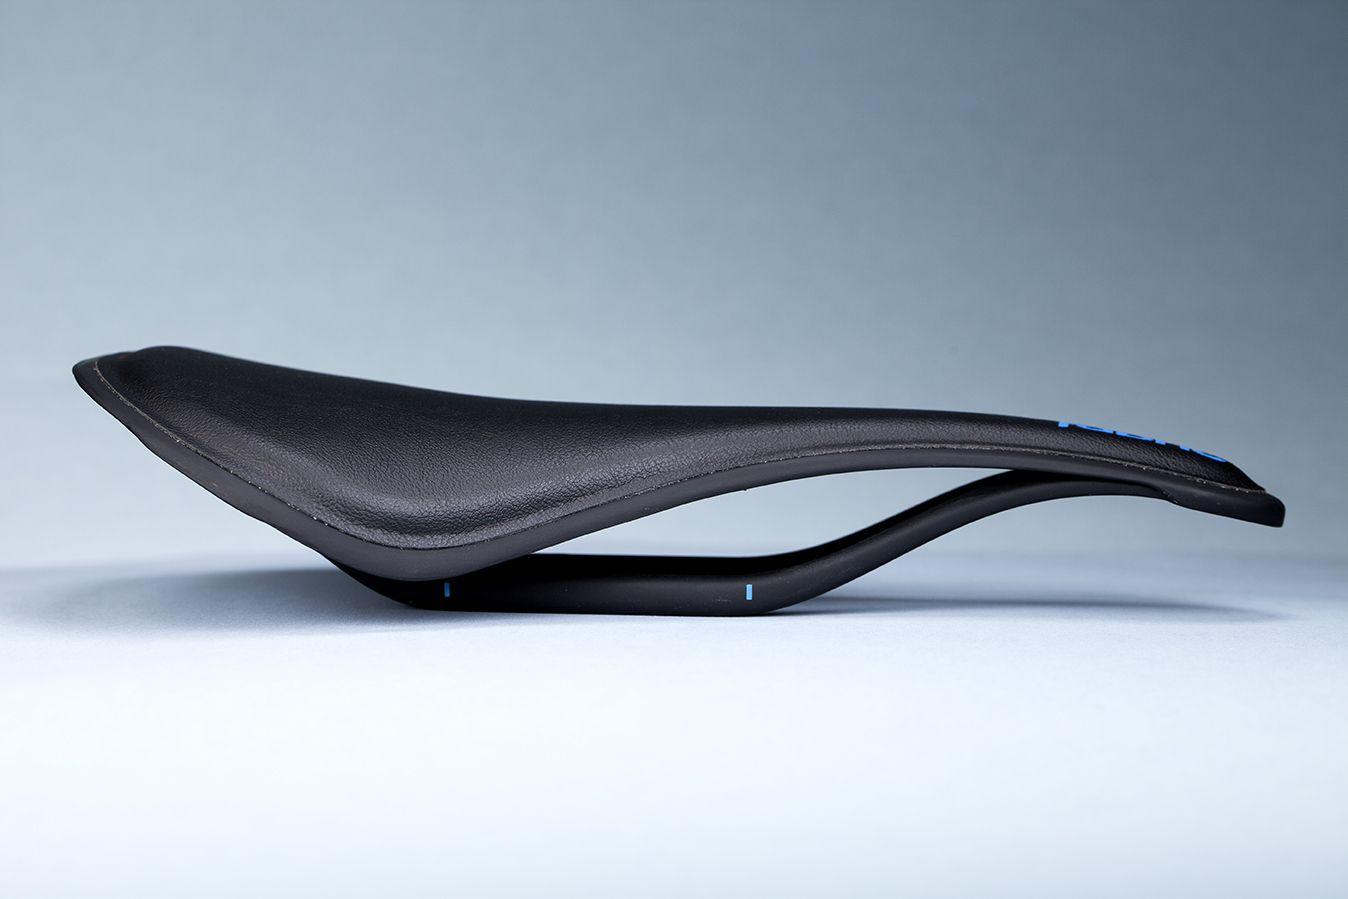 Fabric ALM saddle, top, pic: Jon Denham/Rouleur.cc